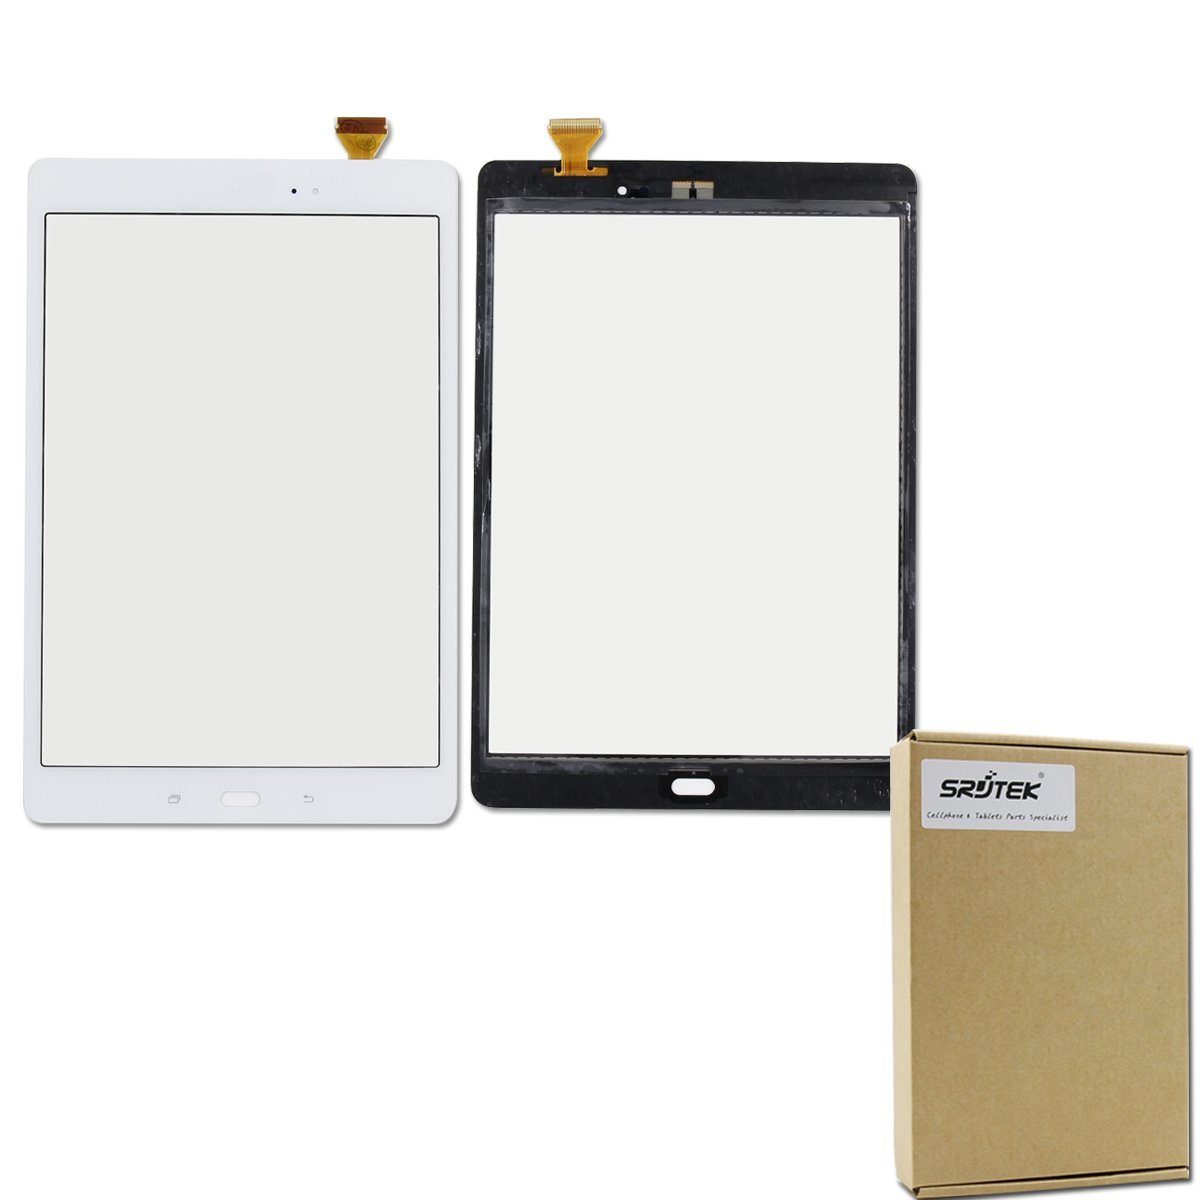 Srjtek Touch Screen Digitizer Replacement Parts for Samsung Galaxy Tab A 9.7,(9.7'') Touch Screen Digitizer Sensor for SM-T550 T550 T551 T555(White)